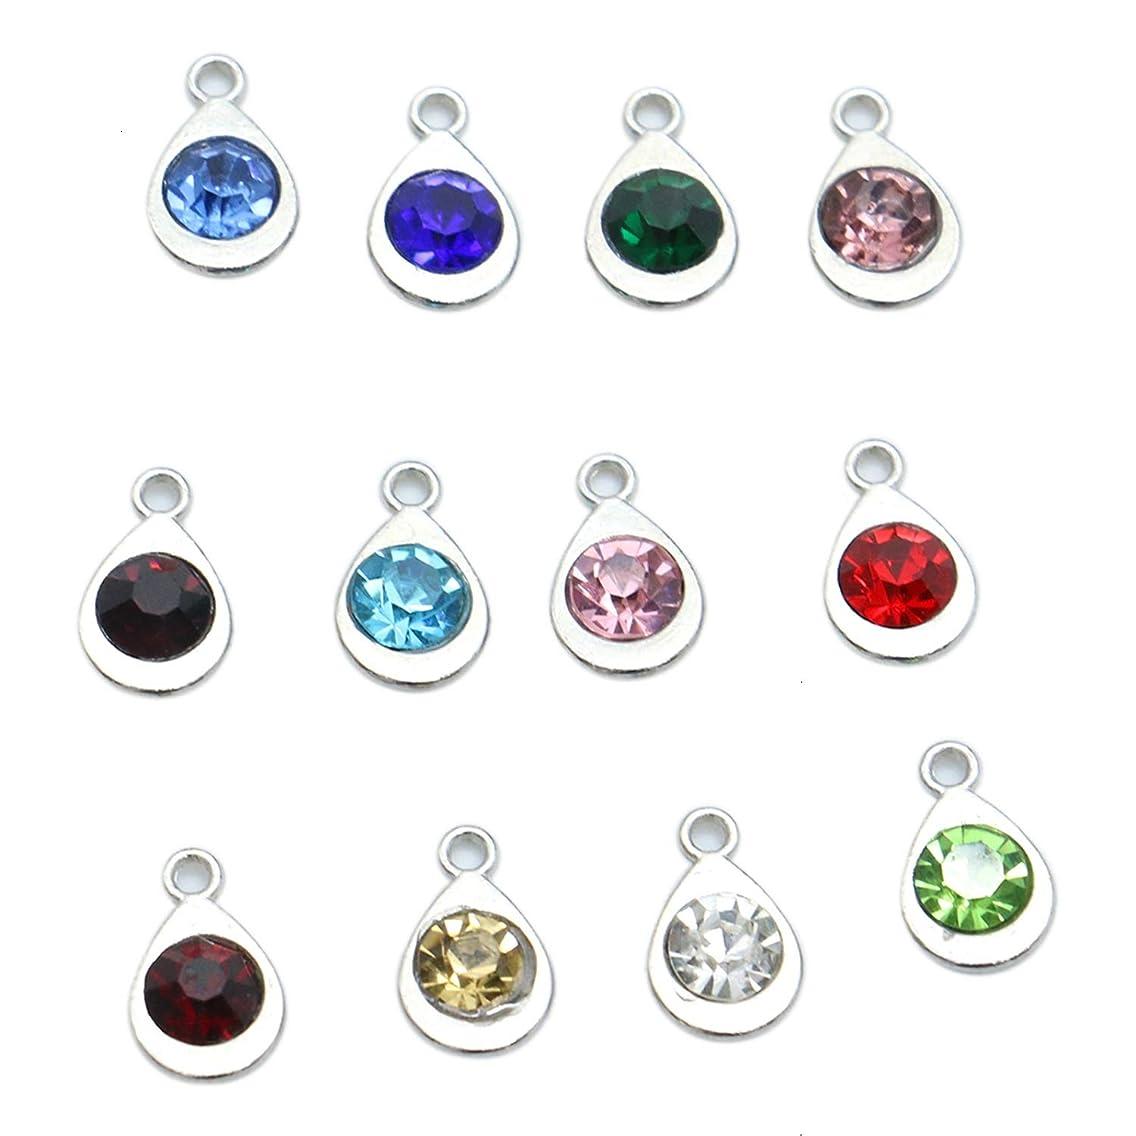 Monrocco 12 pcs Birthstone Charms Teardrop Water Drop Crystal Birthstone Charm Rhinesotone Beads for DIY Necklace Bracelet Jewelry Making